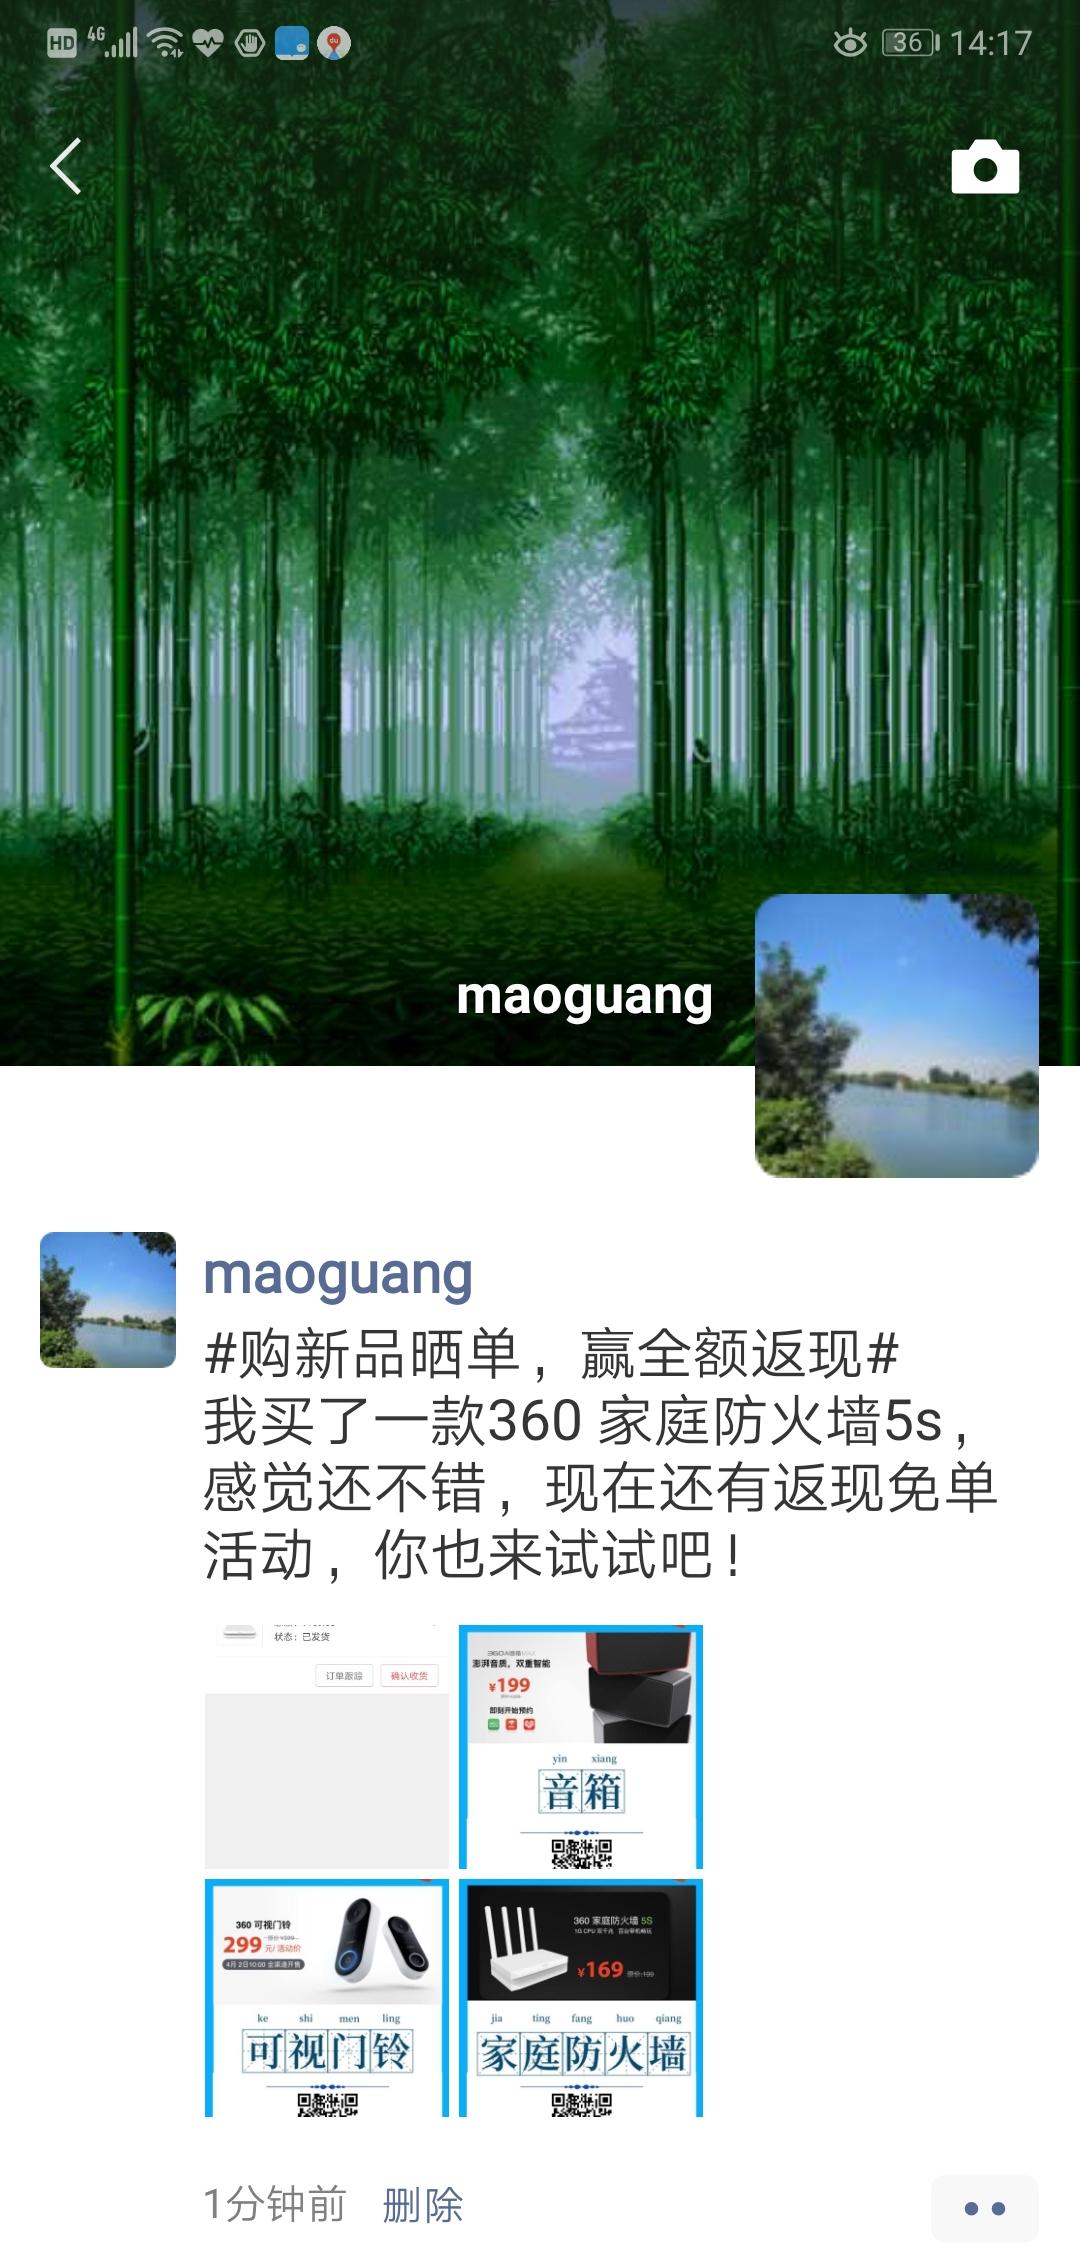 Screenshot_20190403_141725_com.tencent.mm.jpg